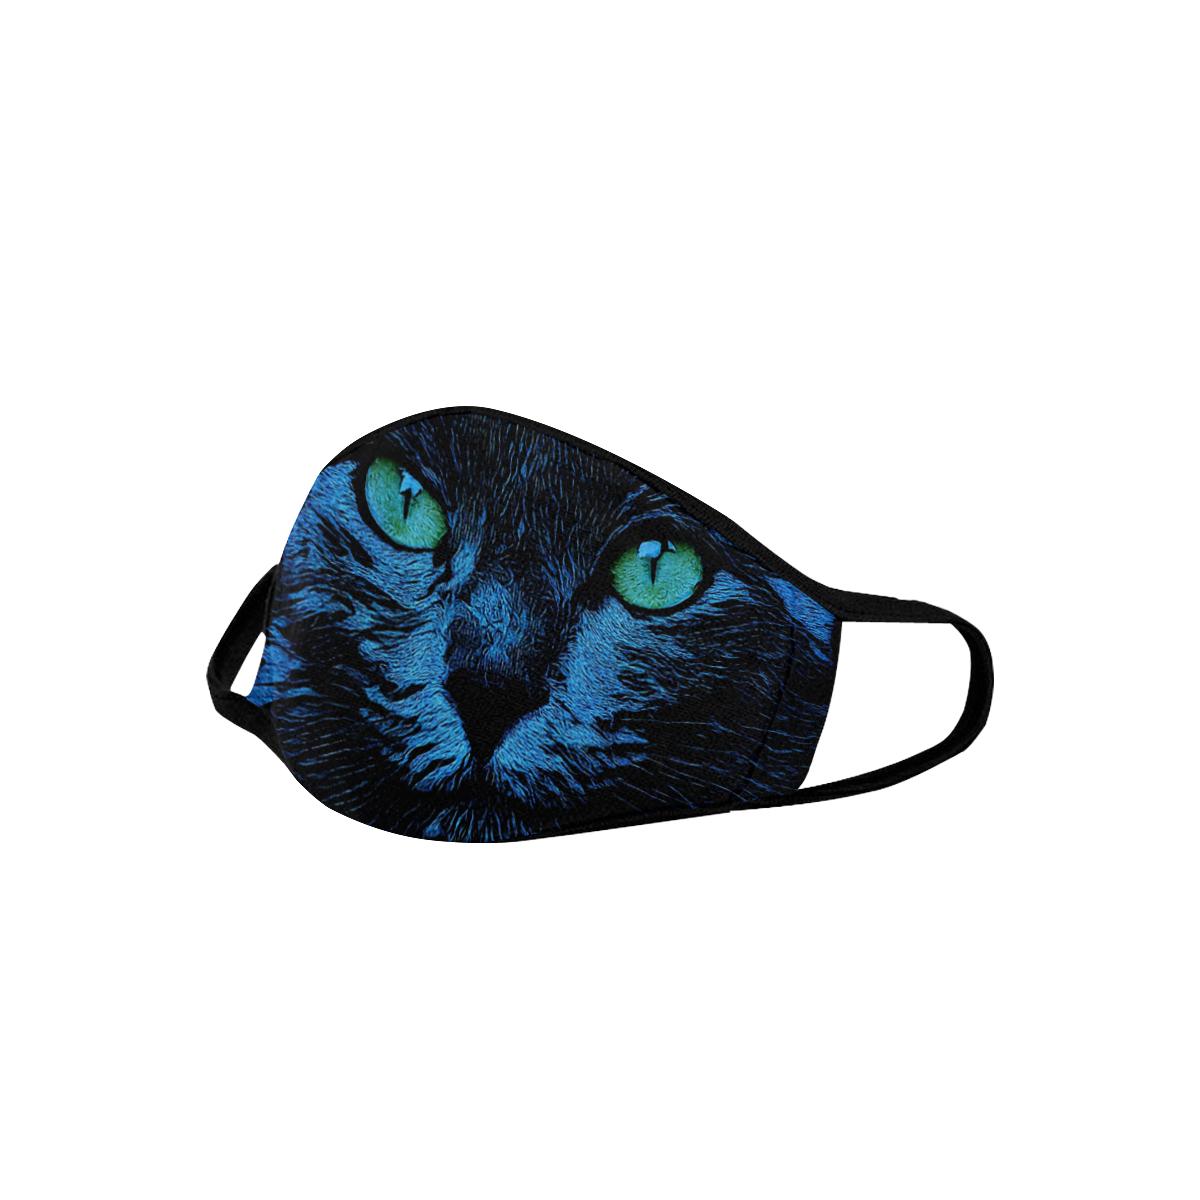 CAT BLUE ART MASK Mouth Mask